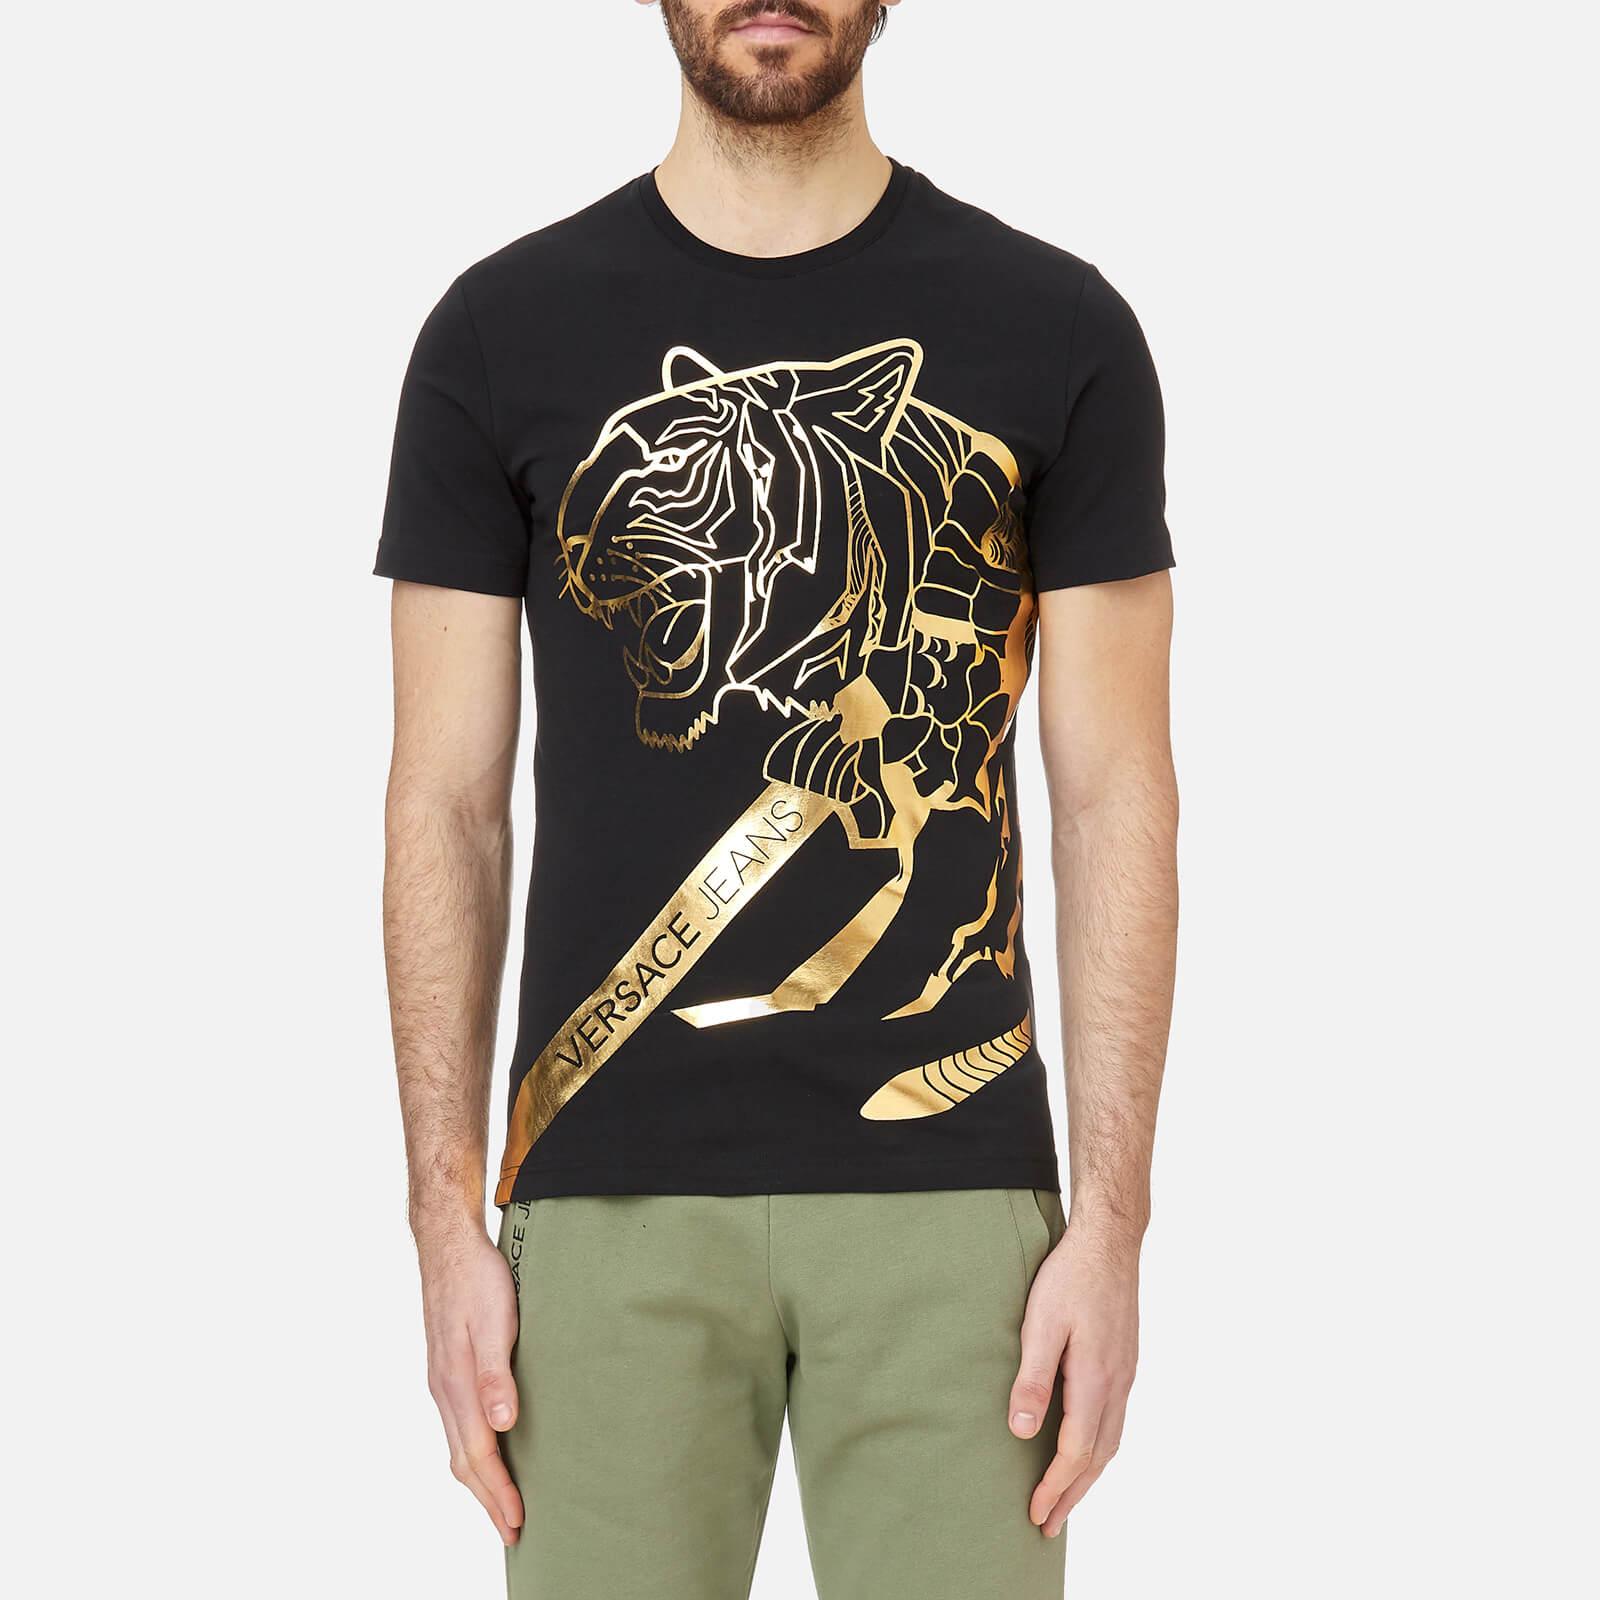 53602b1d1 Versace Jeans Men's Foil Print Tiger T-Shirt - Black/Gold Clothing |  TheHut.com